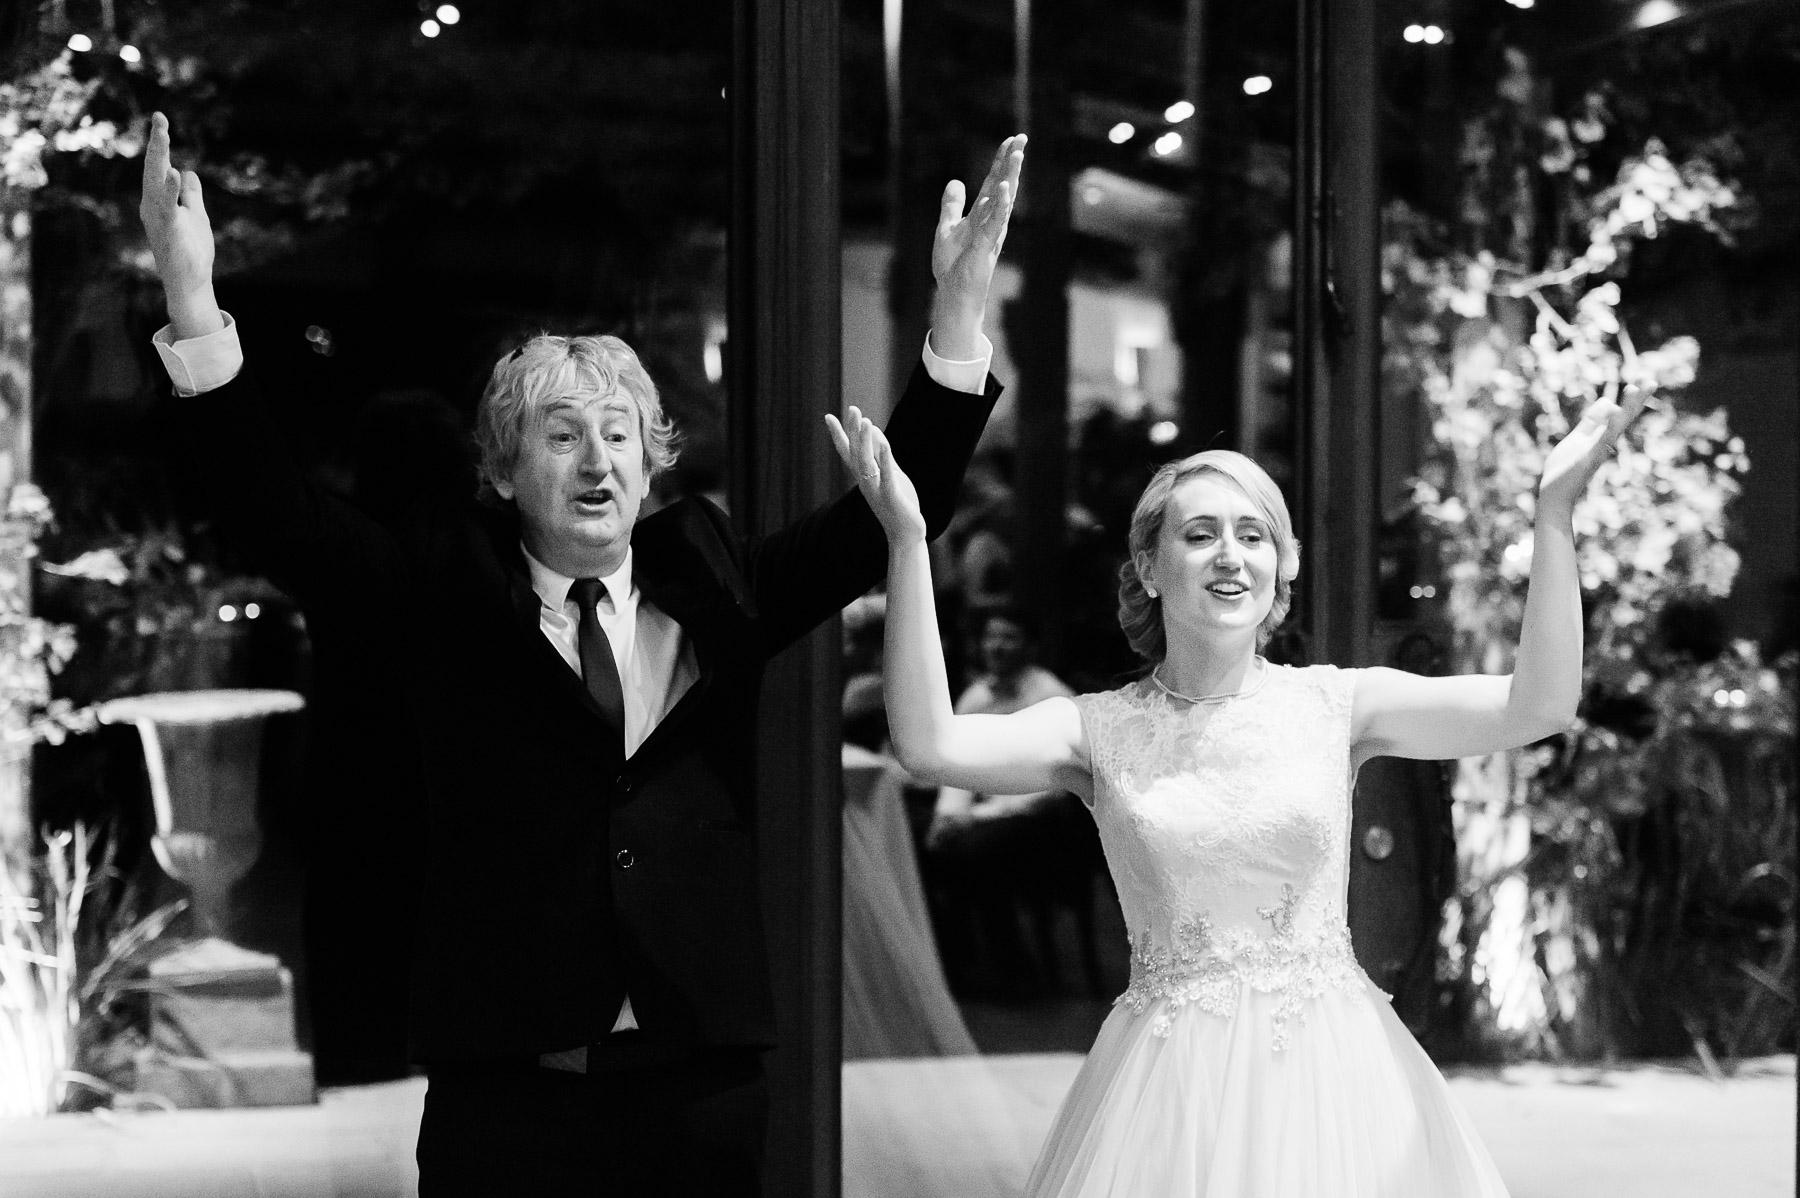 Marnie_and_Charlie_Yarra_Valley_Wedding_Blog-102.jpg